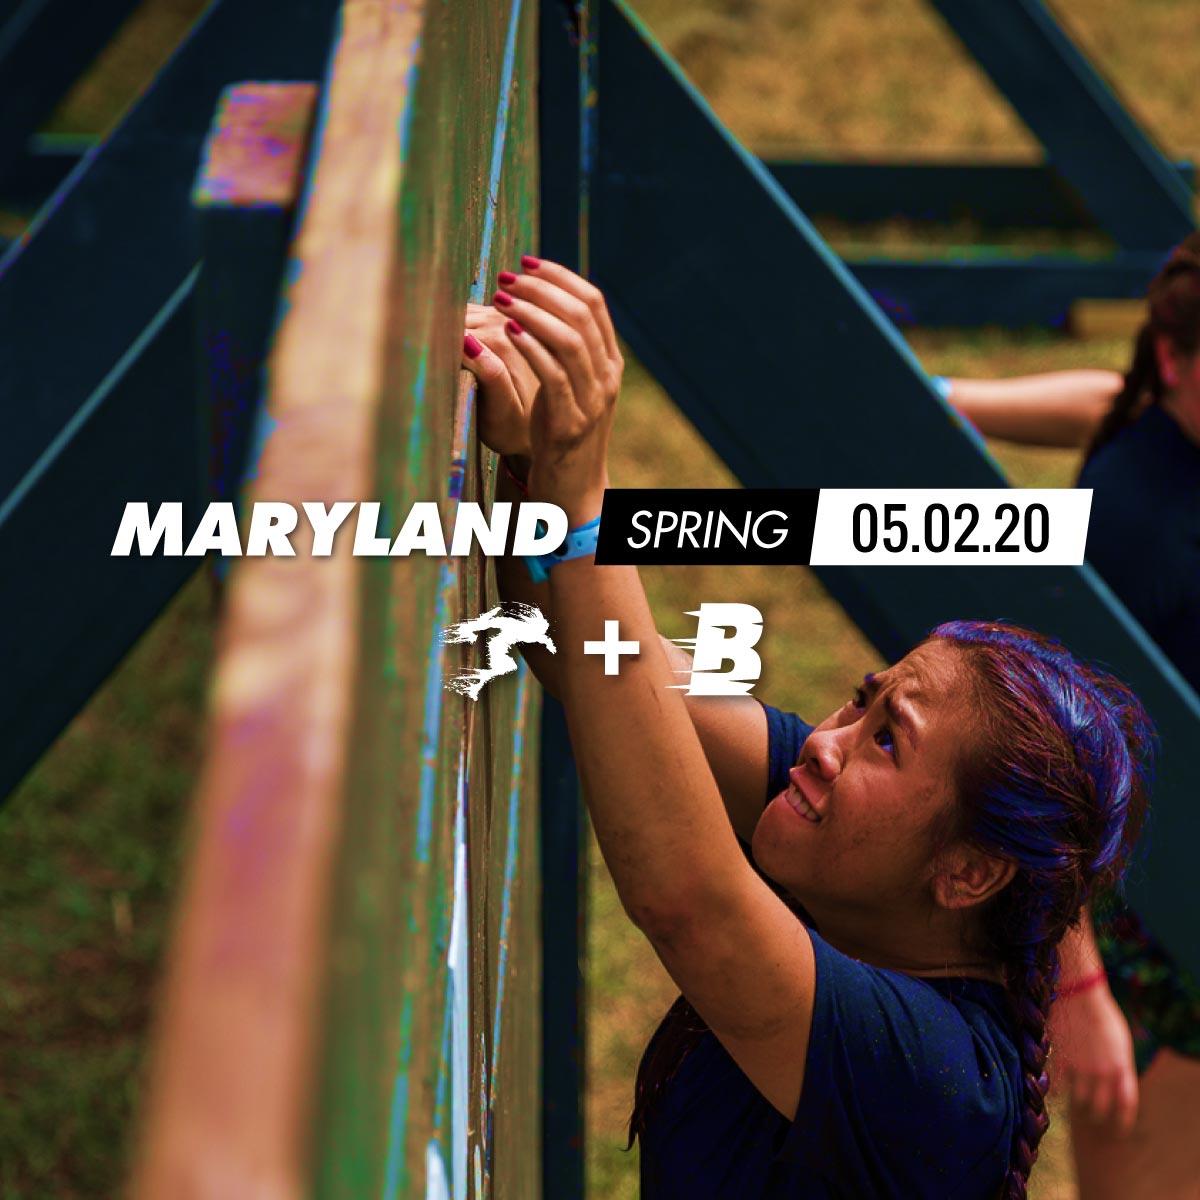 Spectator Pass - Savage Race Maryland Spring 2020